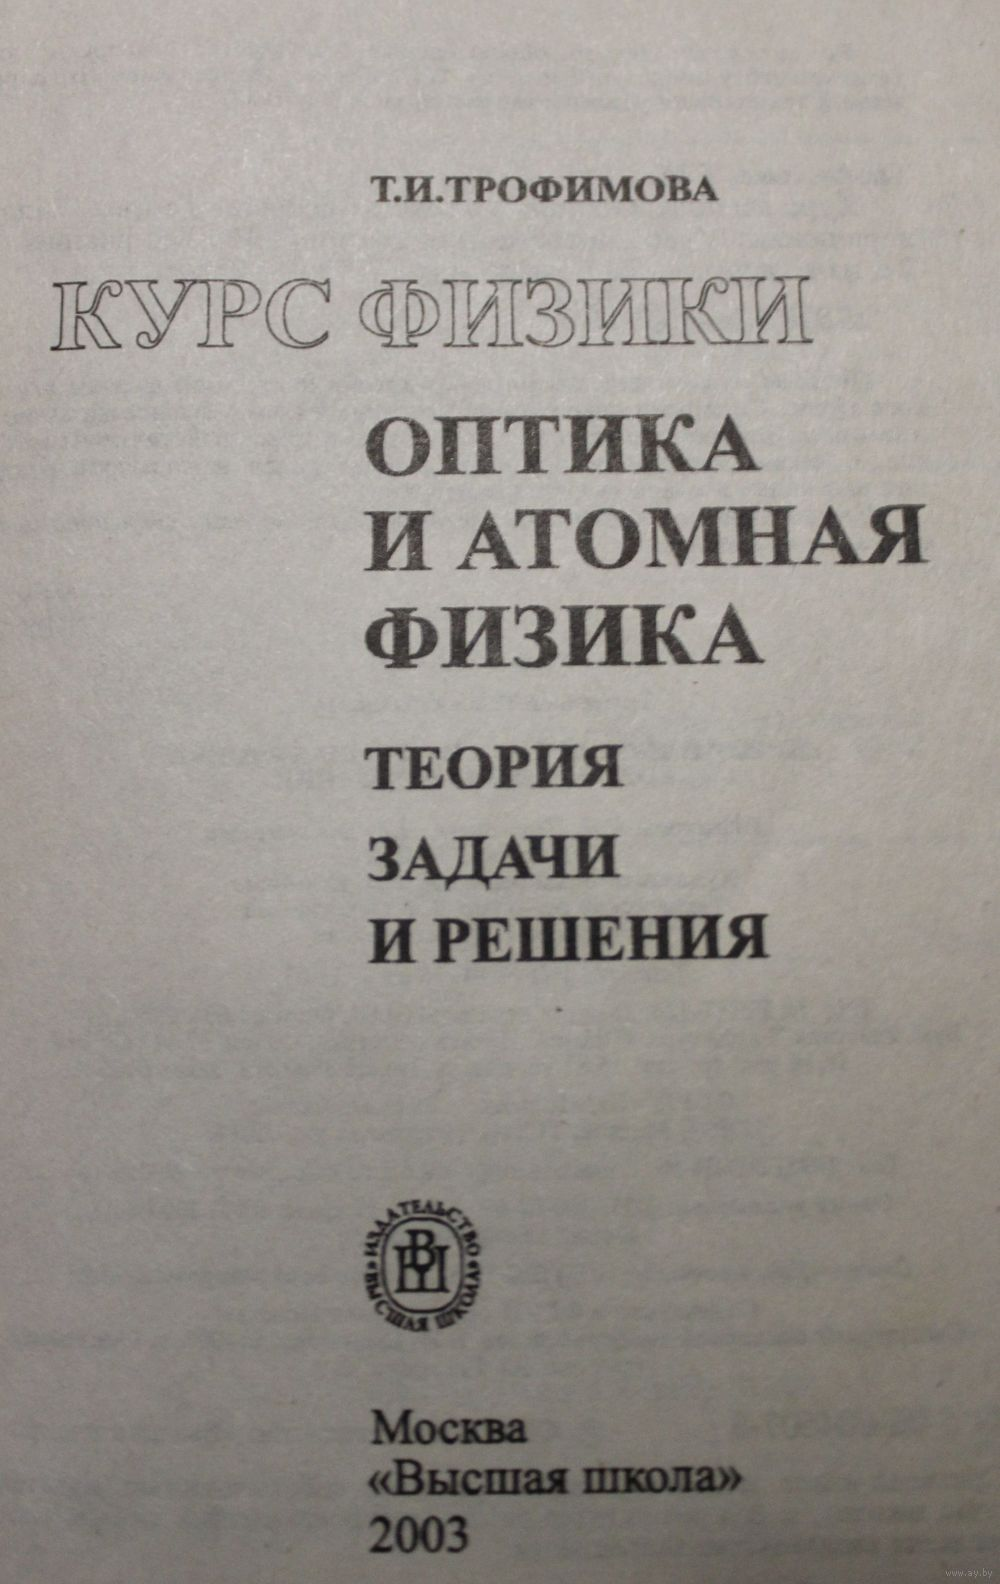 Т.и трофимовий физика гдз